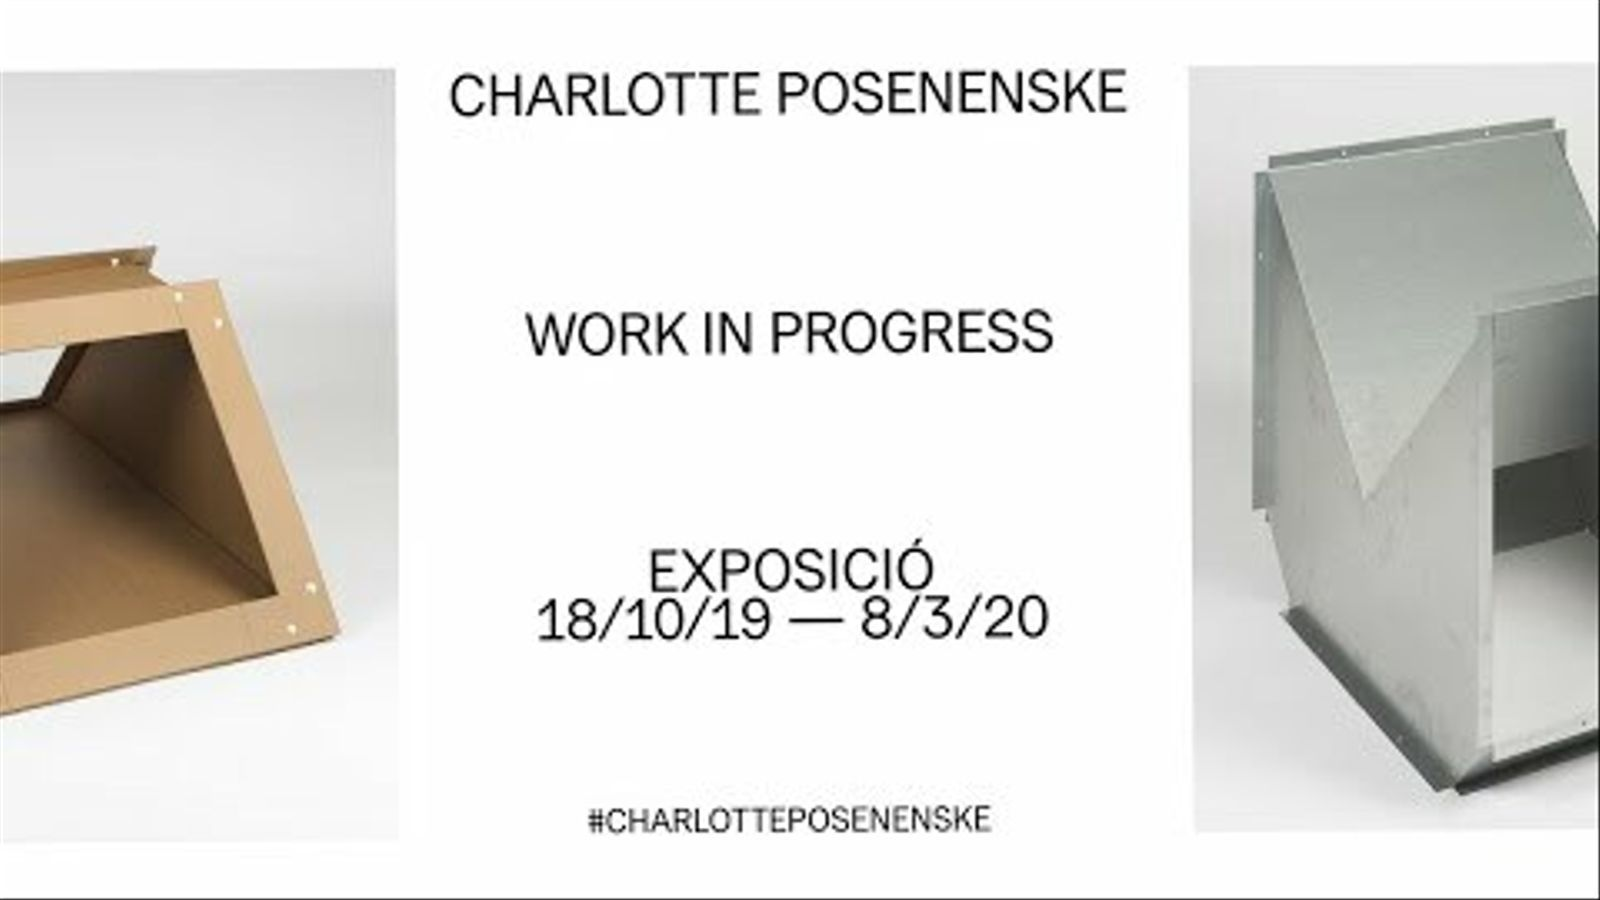 Charlotte Posenenske: Work in Progress